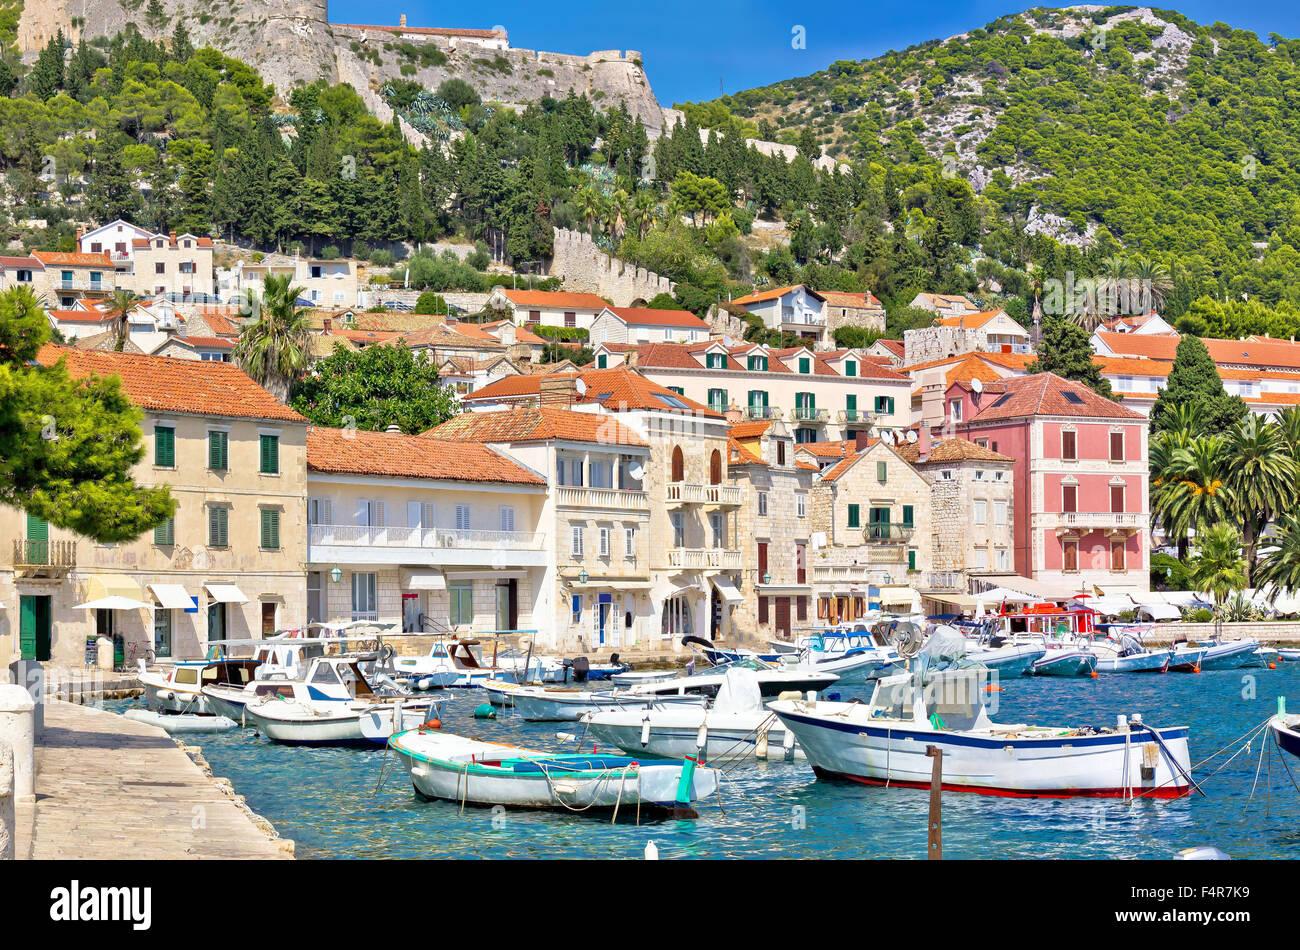 Island of Hvar waterfront architecture, Dalmatia, Croatia - Stock Image